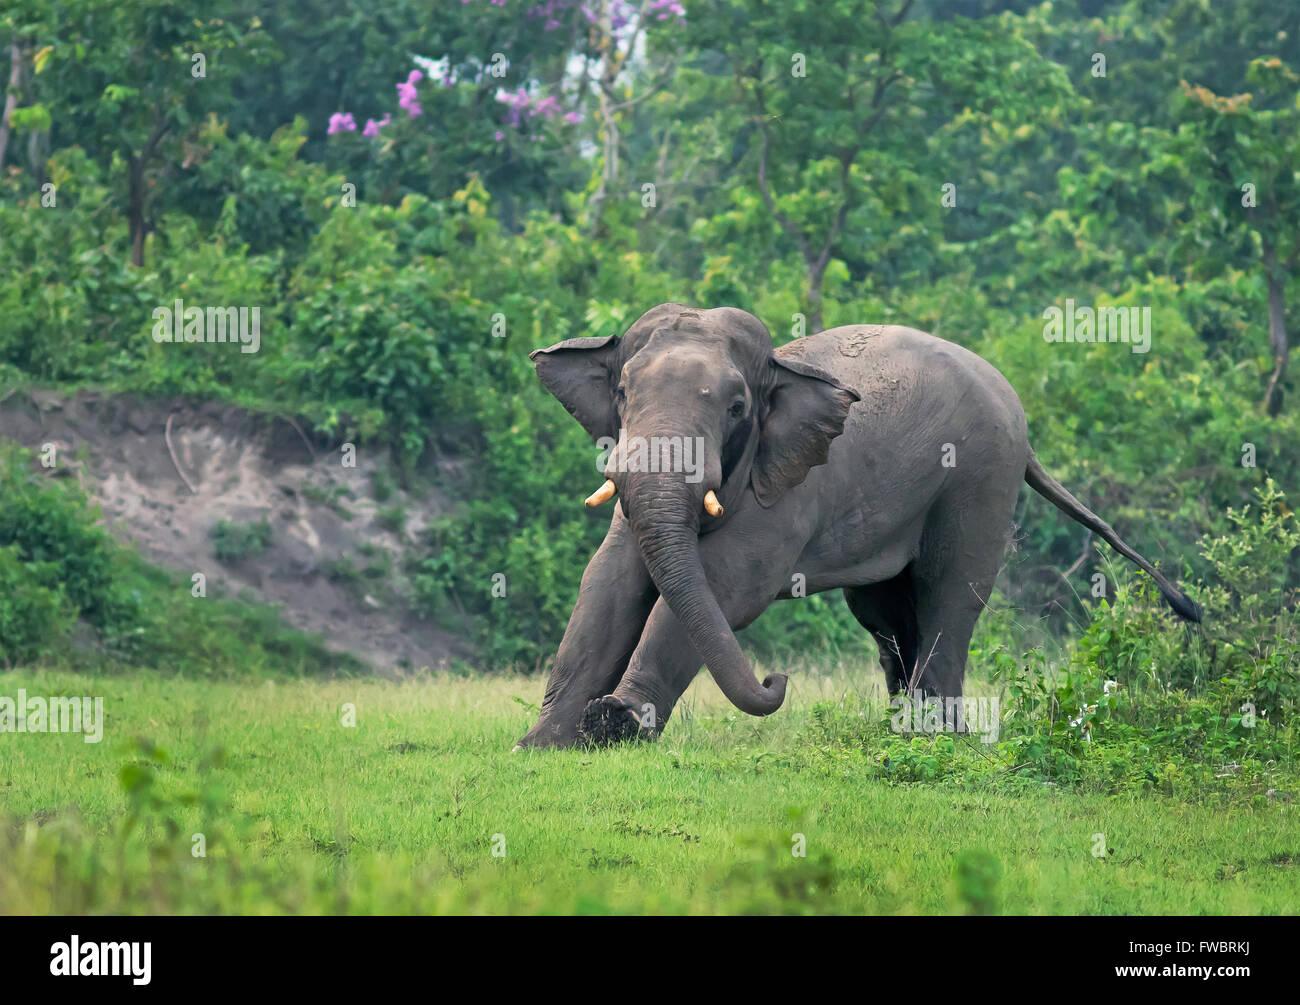 Elephant in Natural Habitat, India - Stock Image